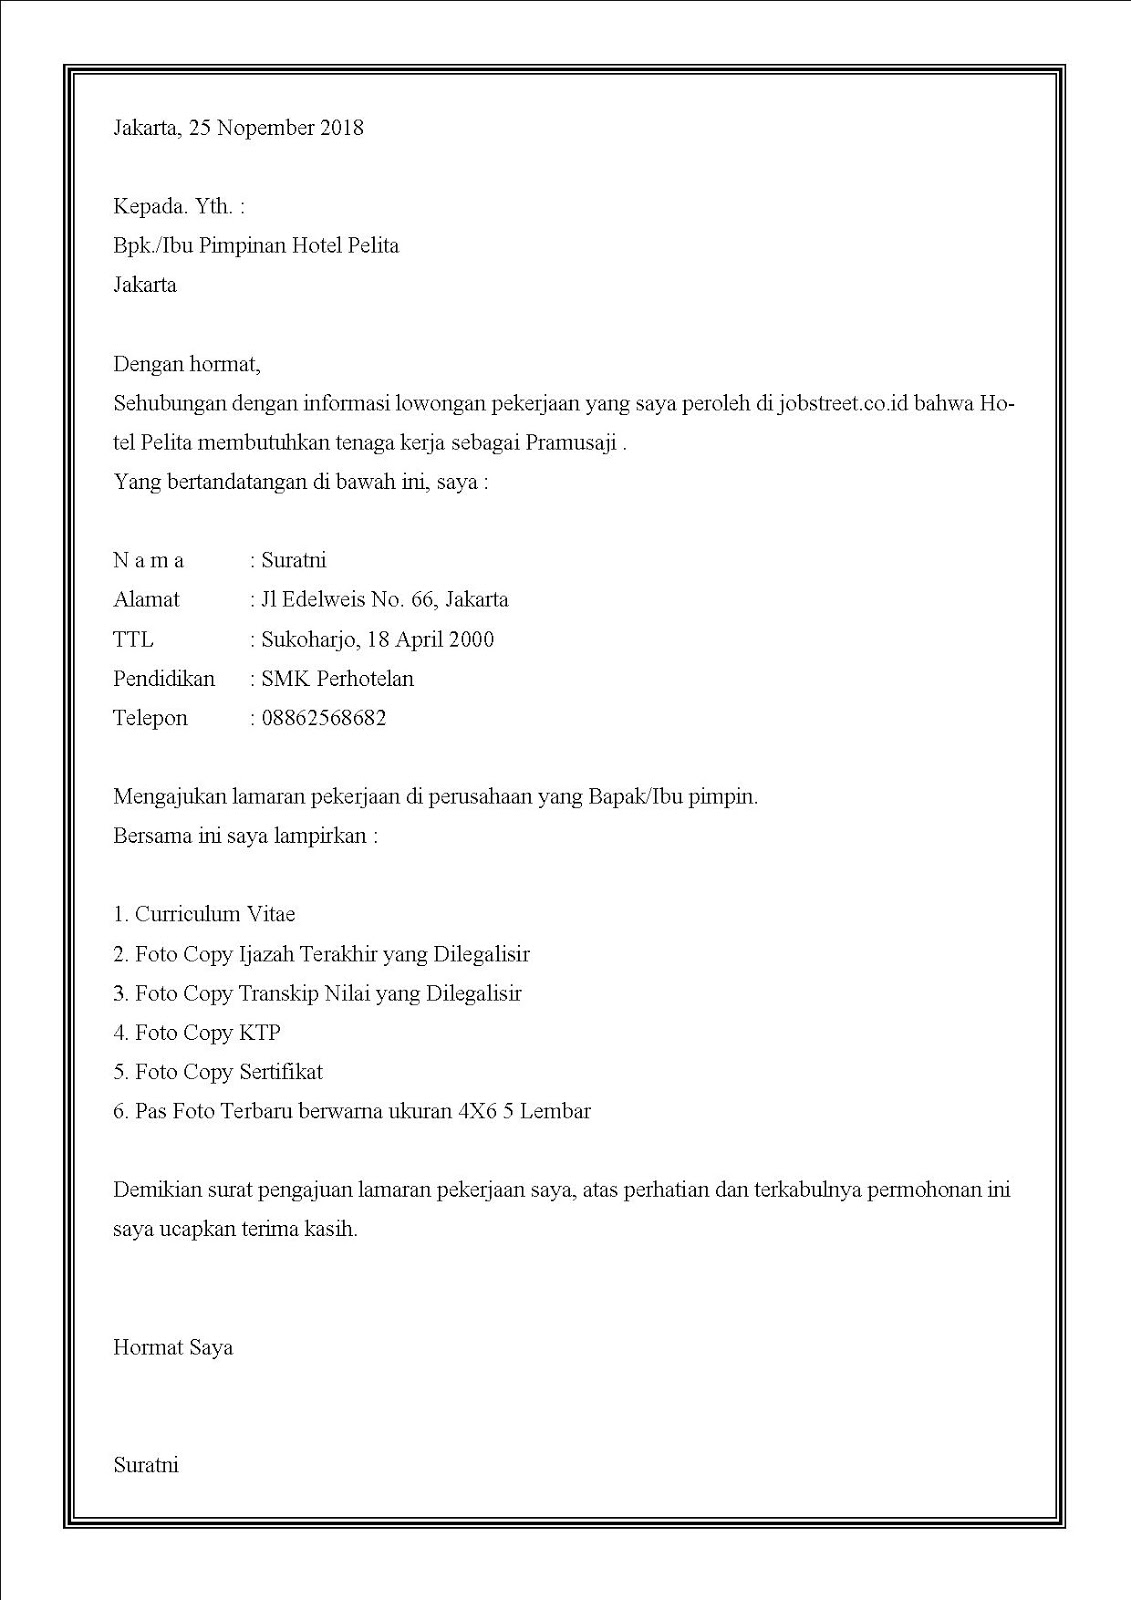 Contoh surat lamaran kerja di hotel sebagai pramusaji